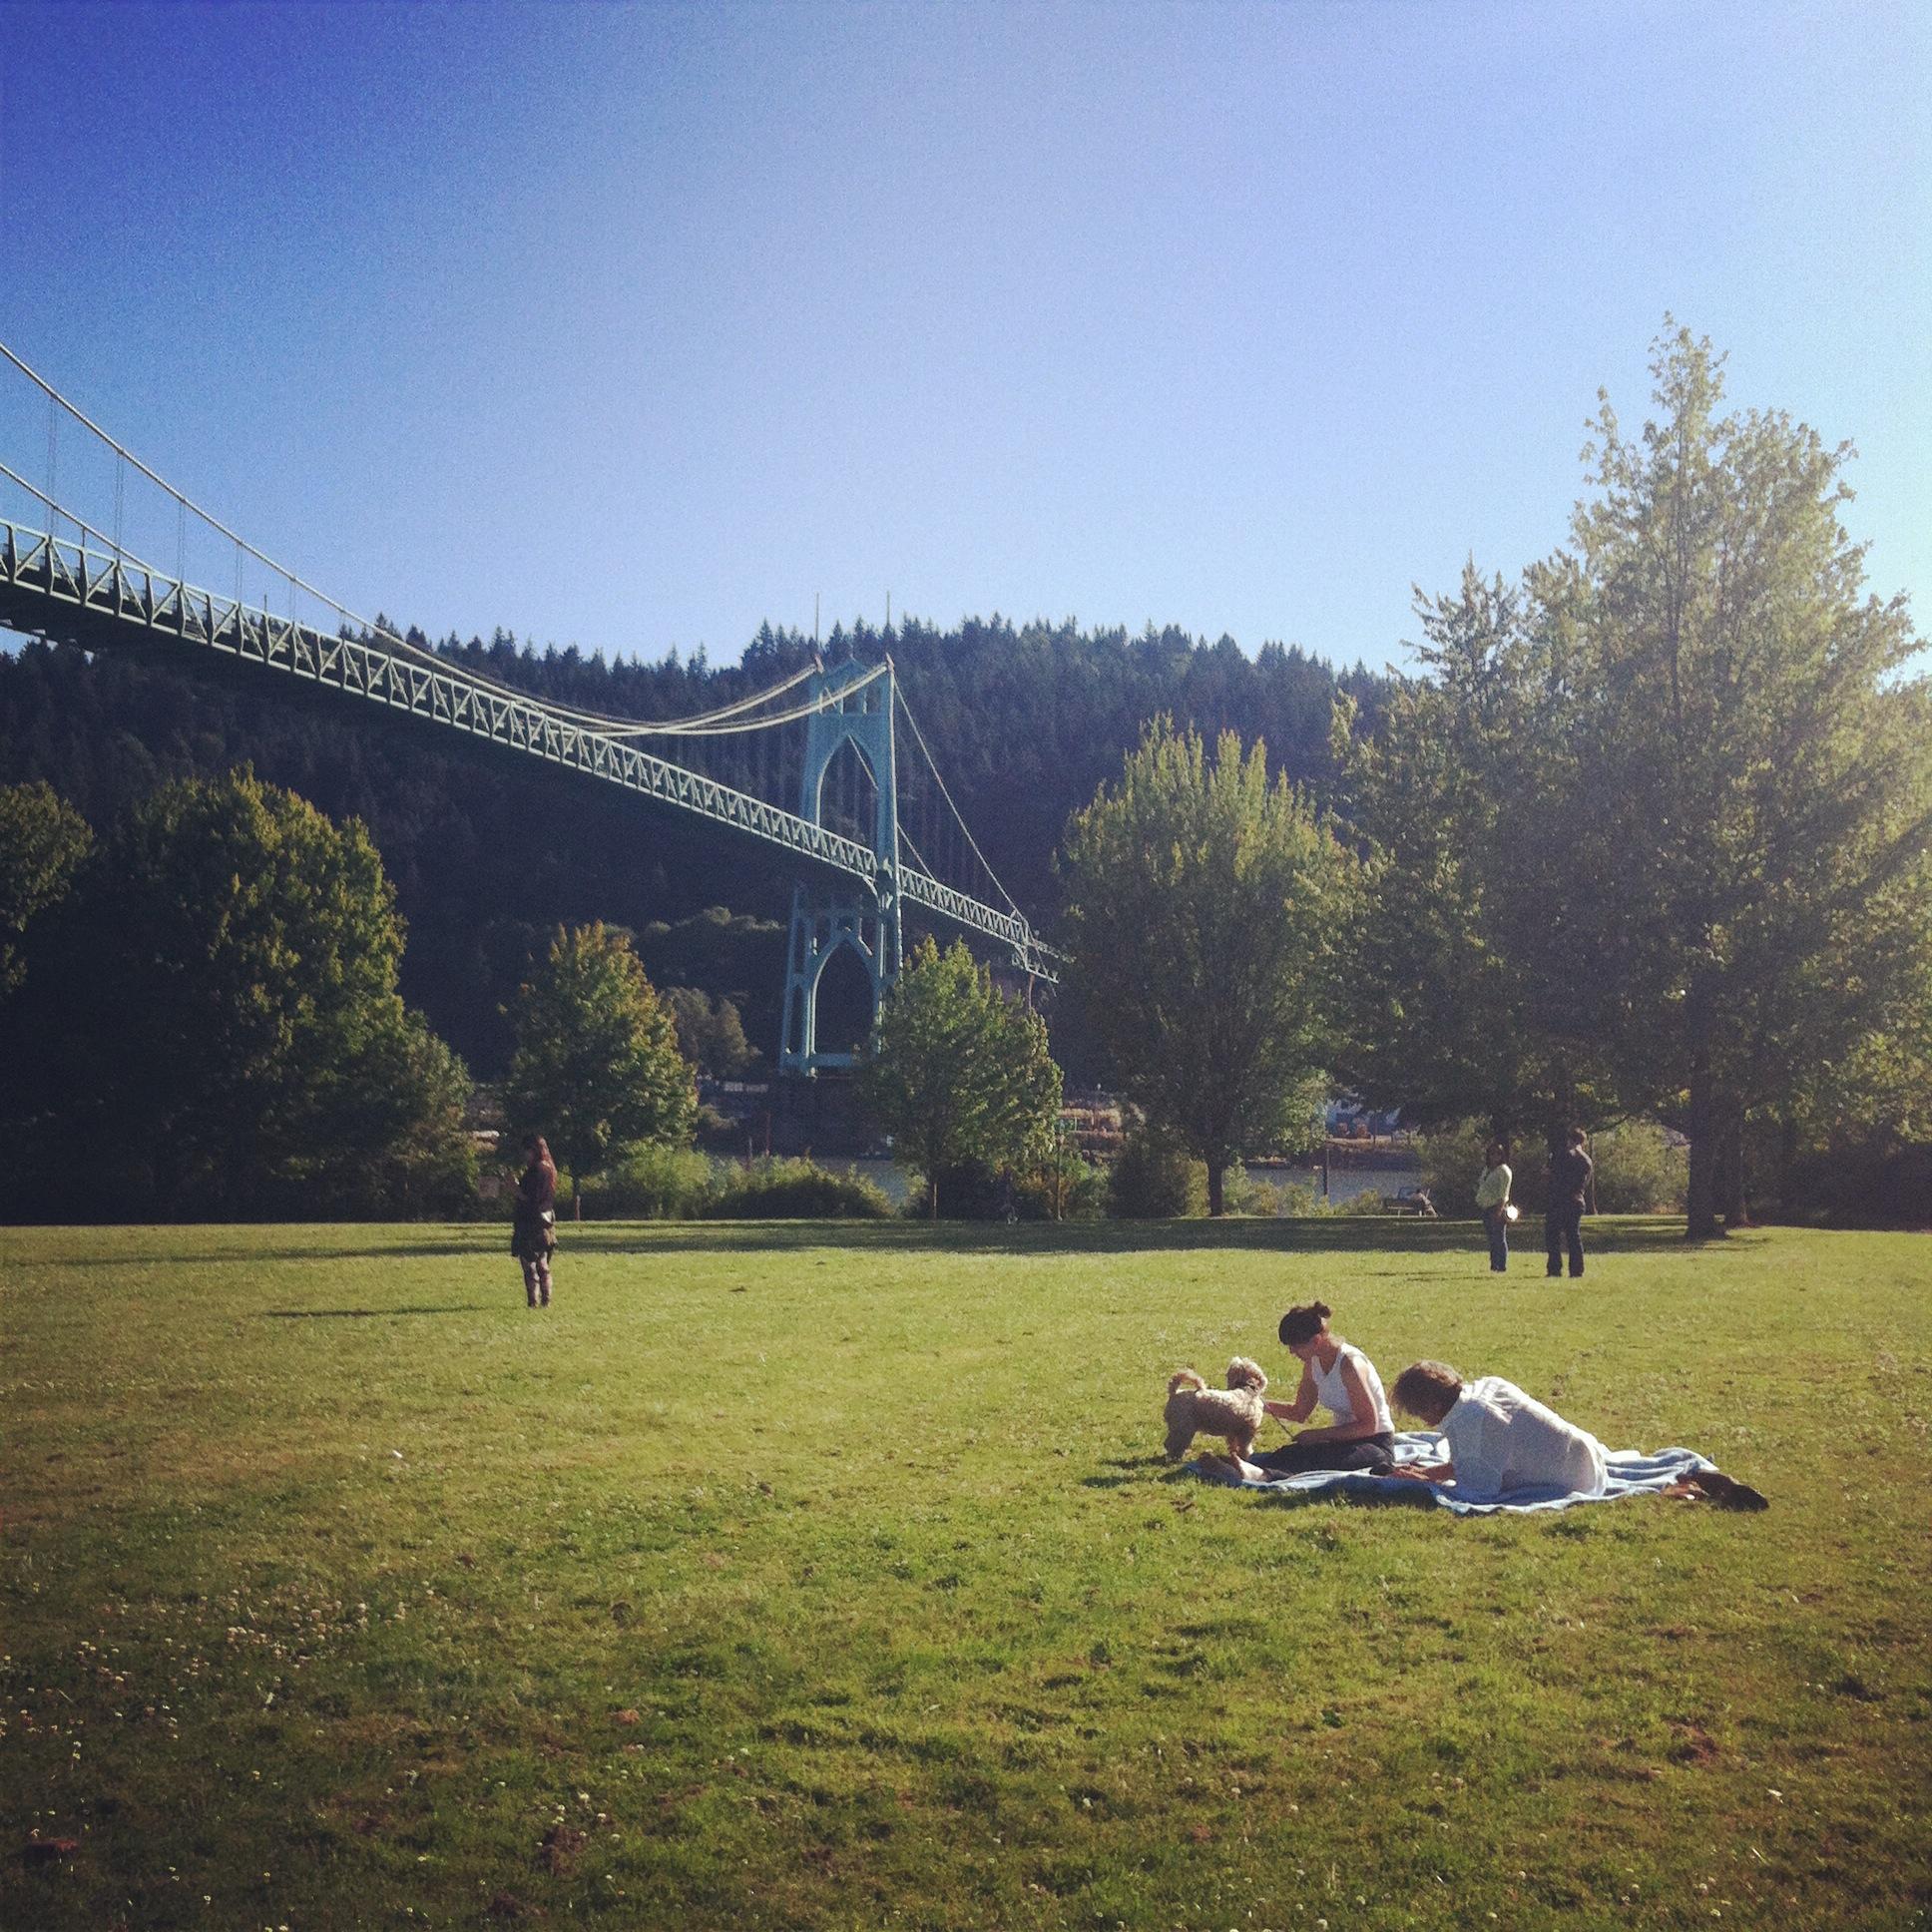 Portland photogallery 2